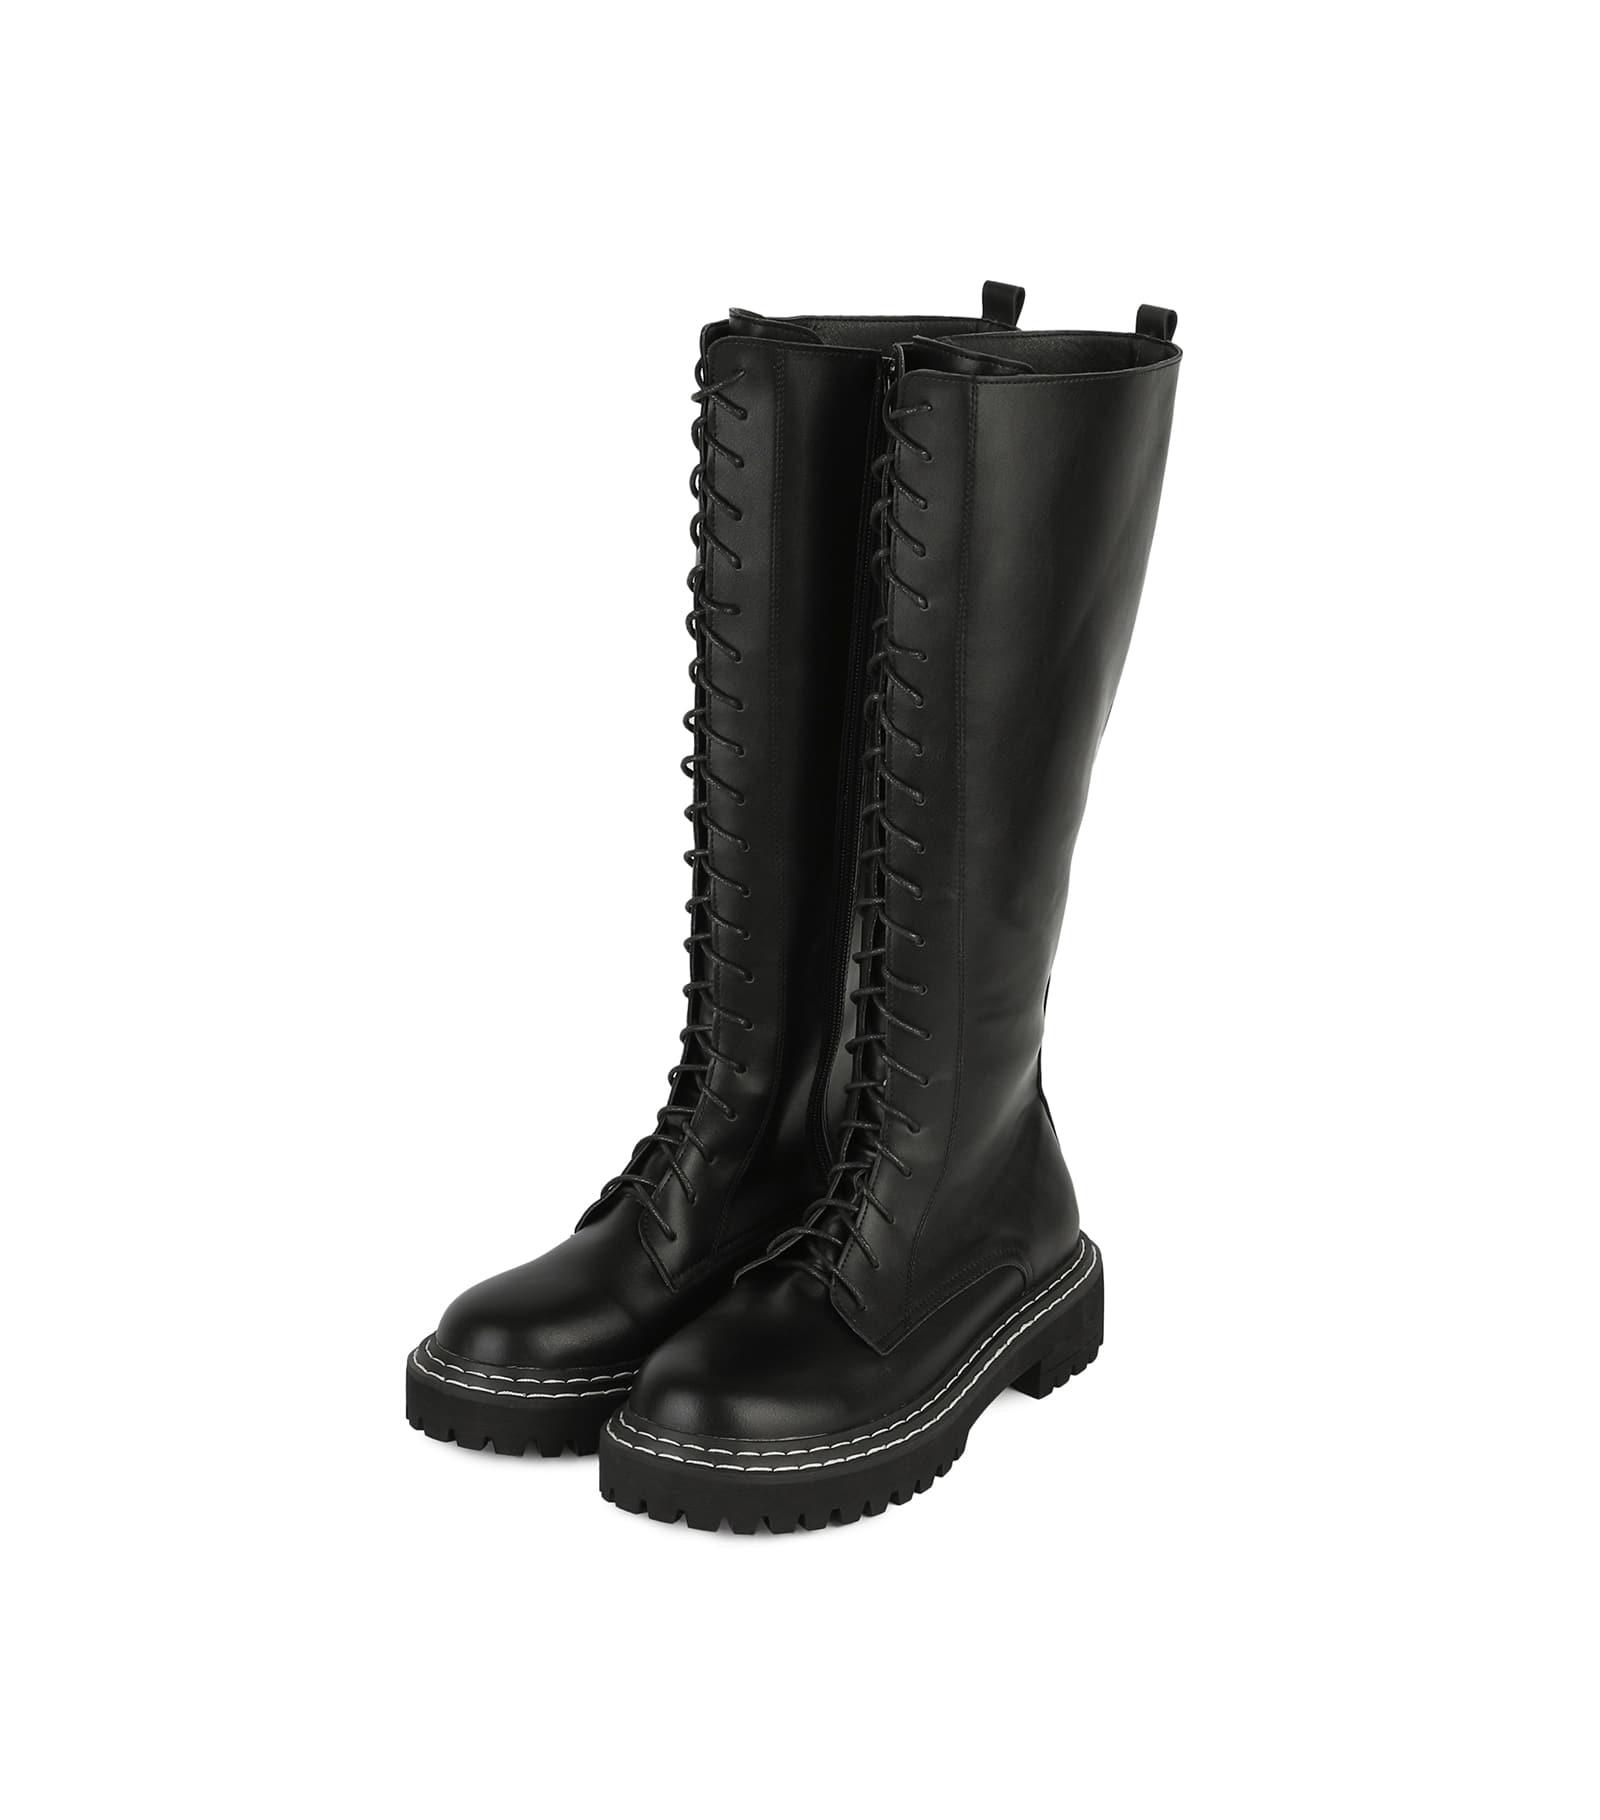 Brave lace-up long walker boots